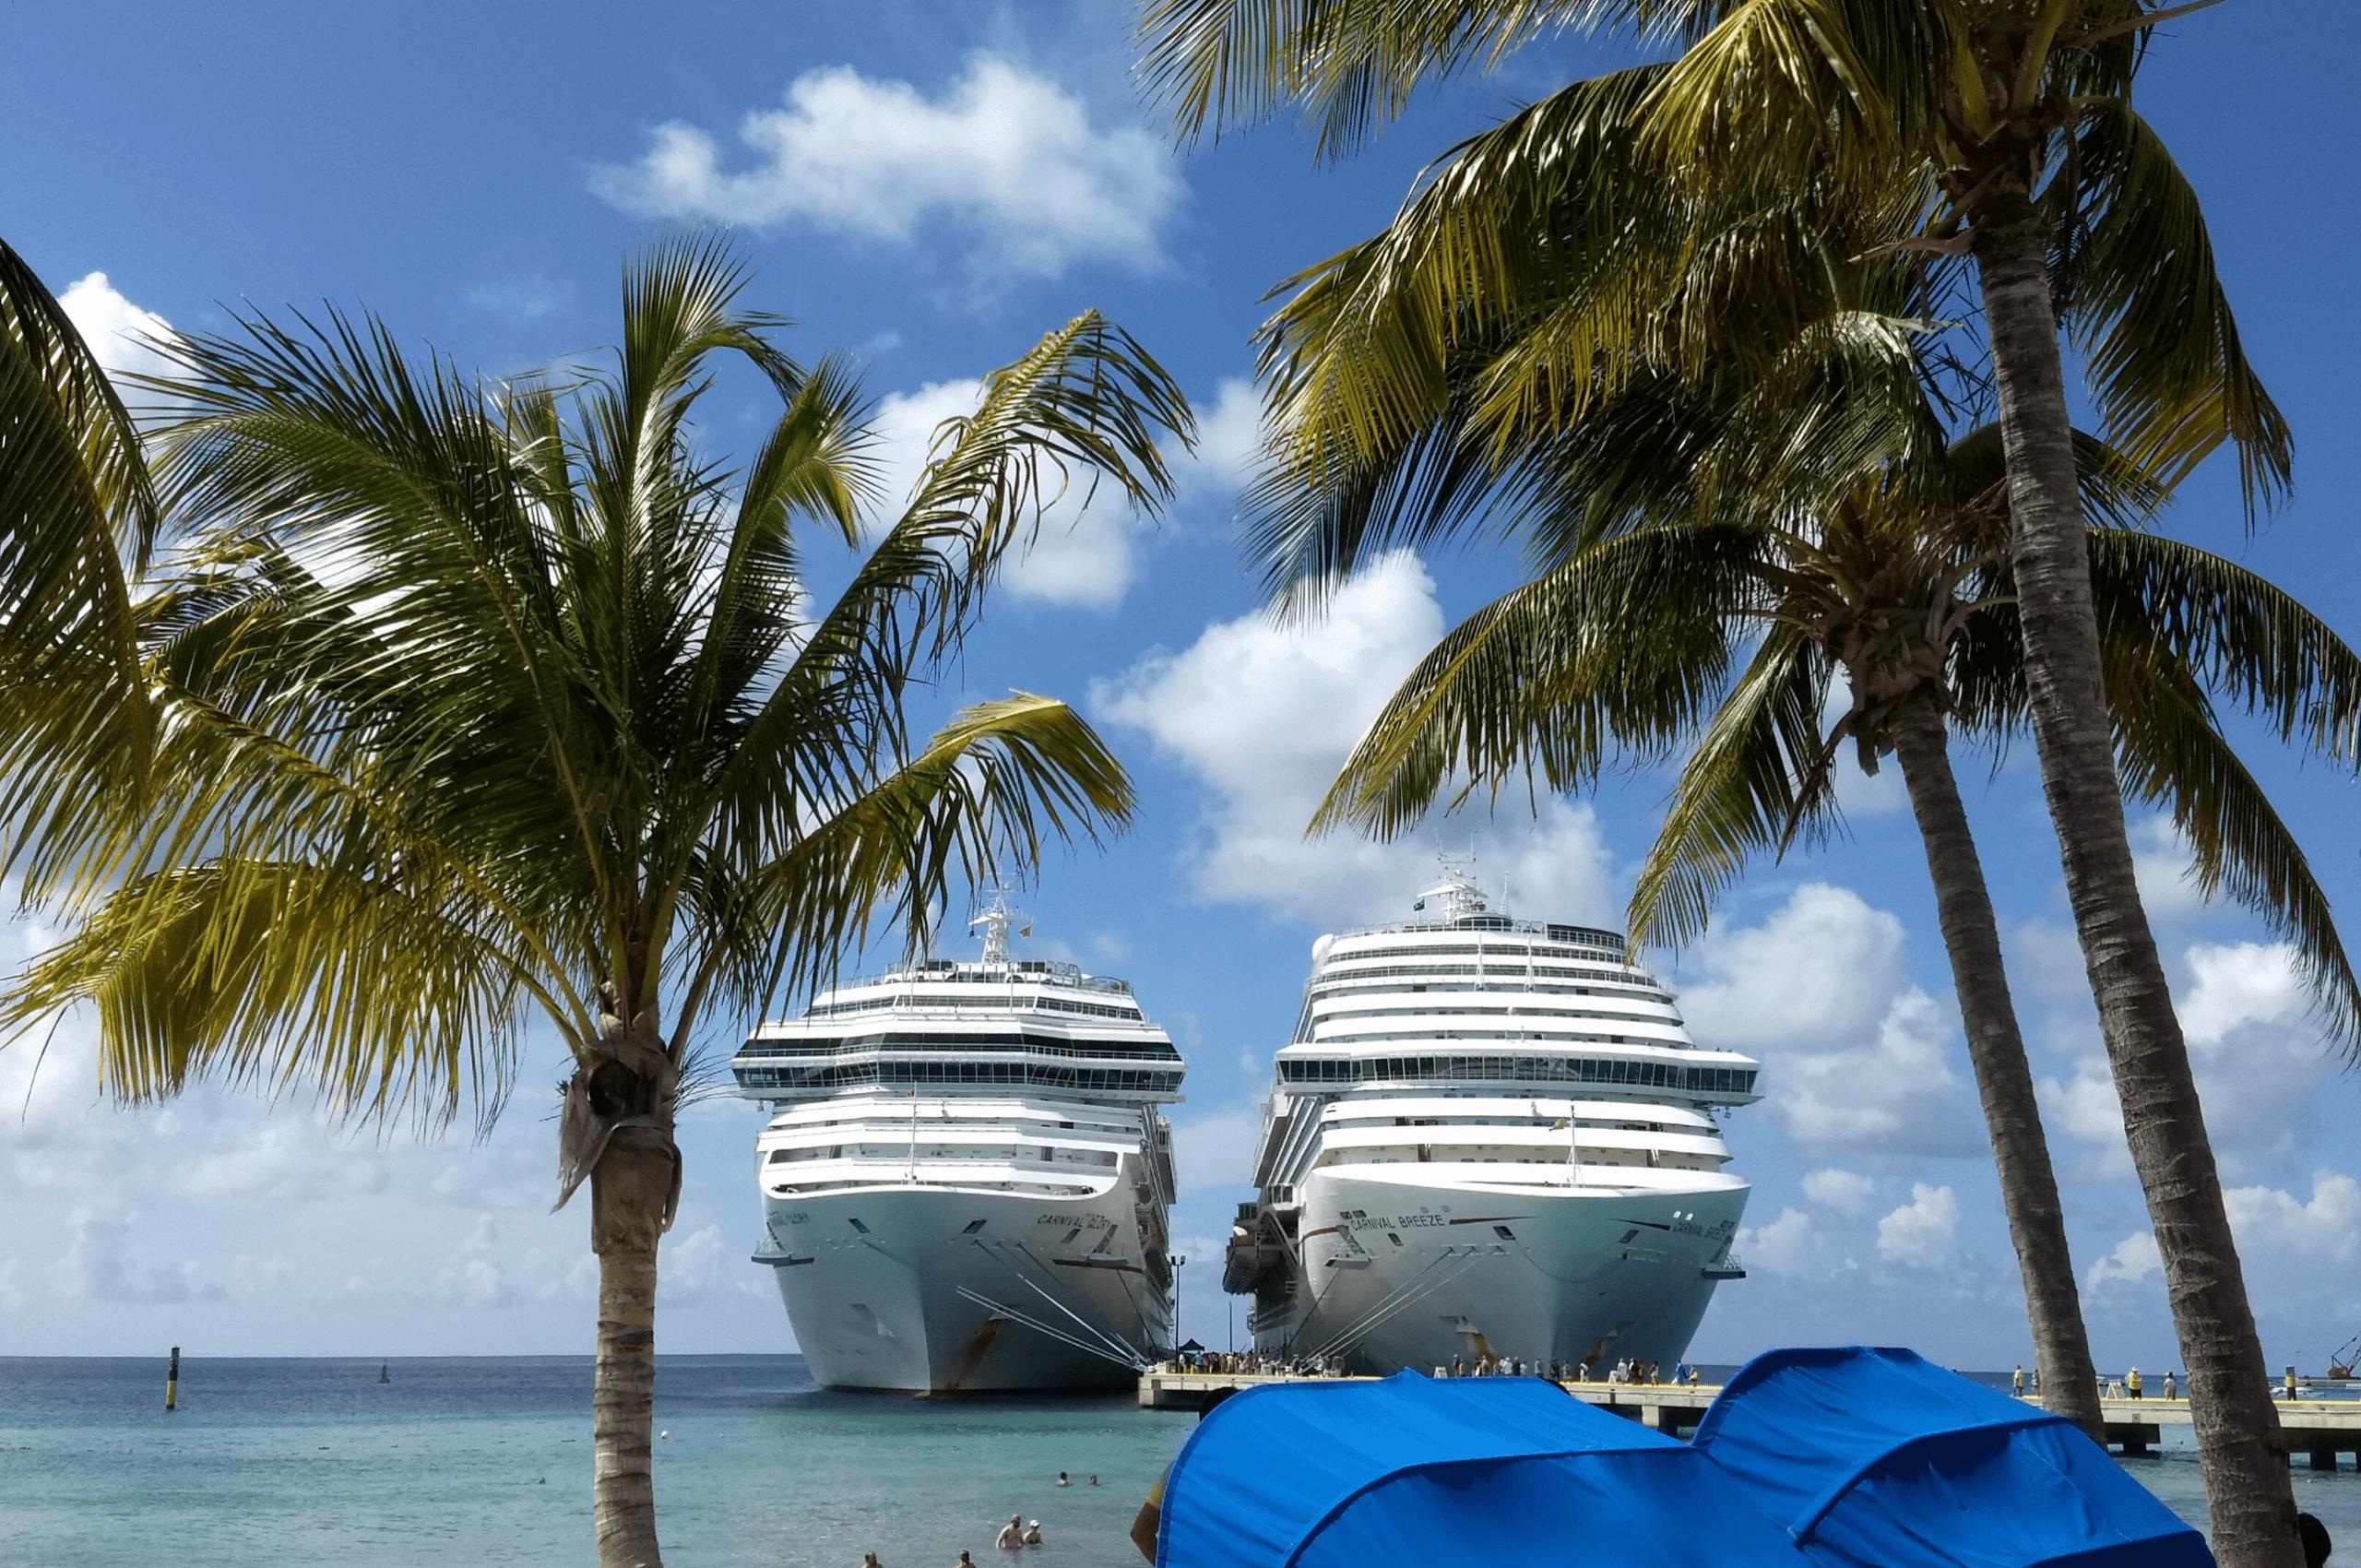 Carnival Breeze, Carnival Glory, Grand Turk Dream Cruises